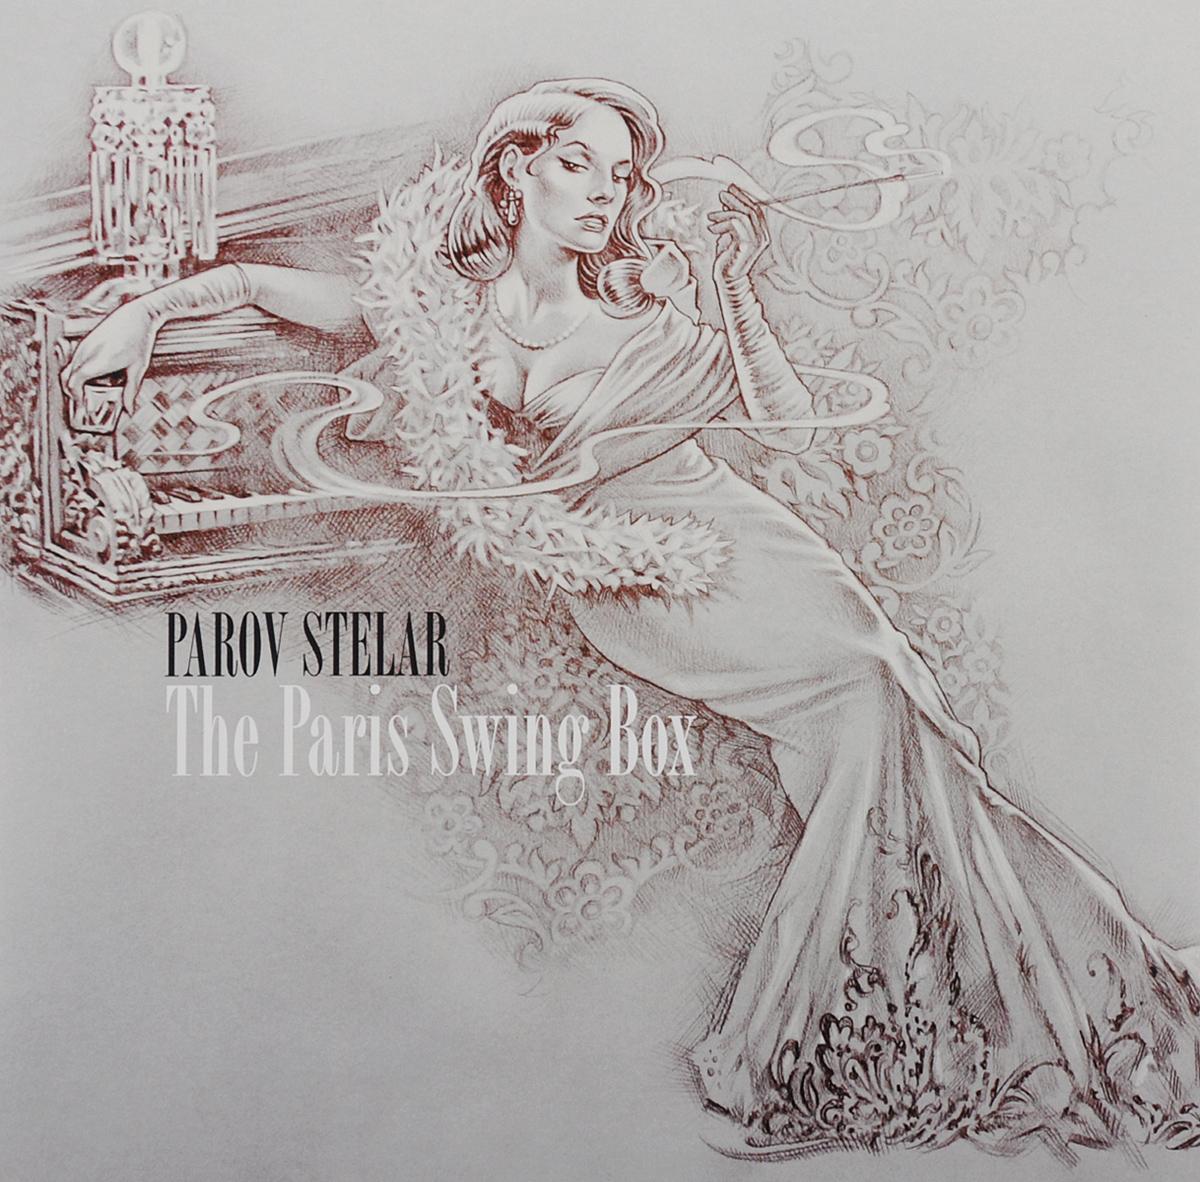 Parov Stelar Parov Stelar. The Paris Swing Box (2 LP) слипмат magma lp slipmat technics paris